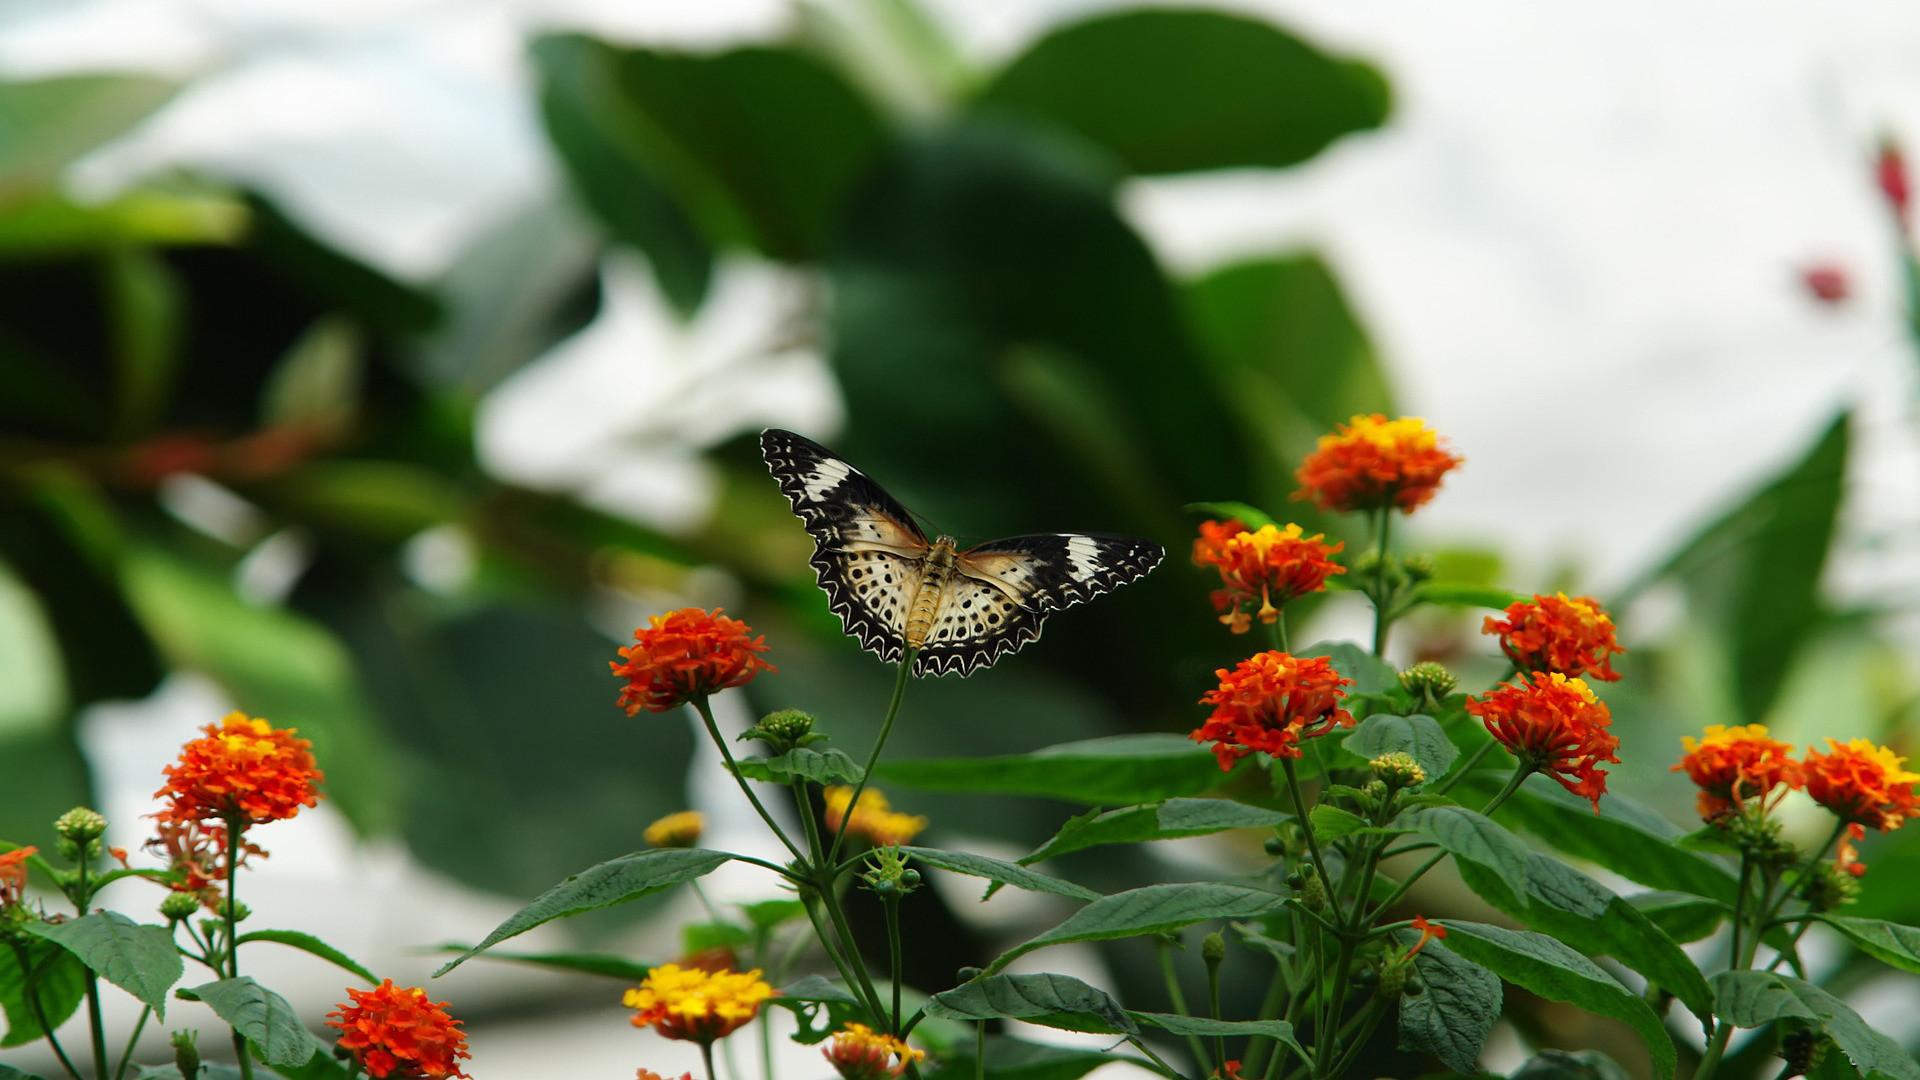 Butterfly Beautiful Hd Wallpaper Wallpapers Points